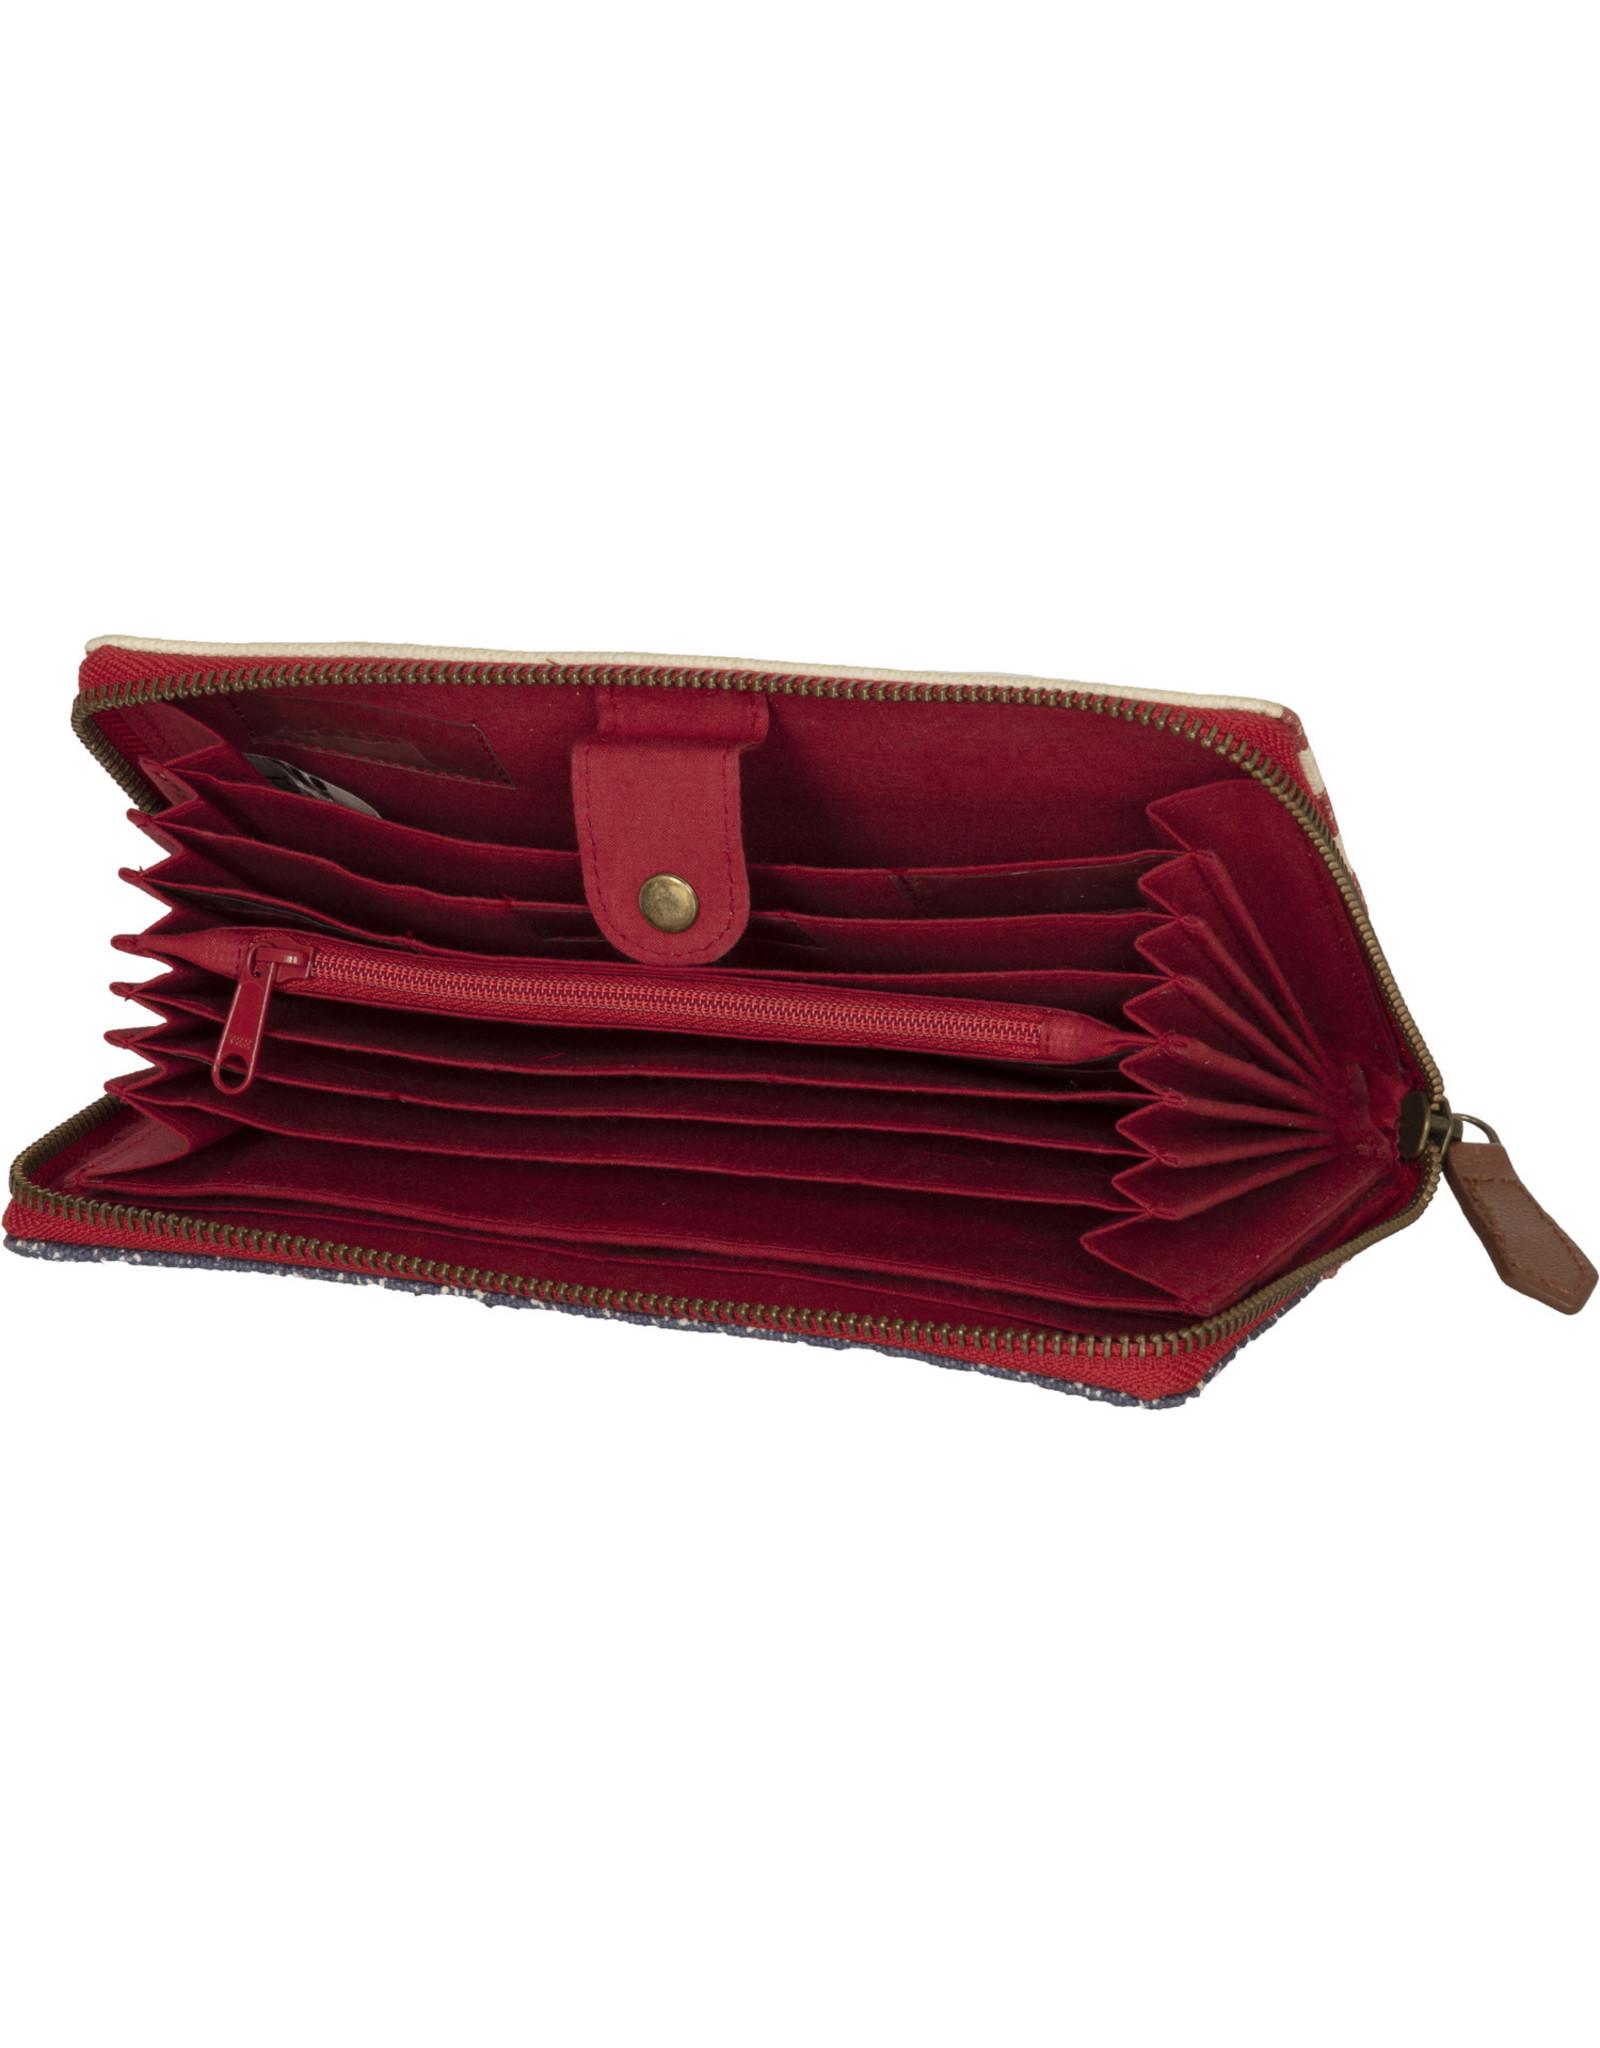 Bella Taylor Antebellum - Canvas Cash System Wallet V2